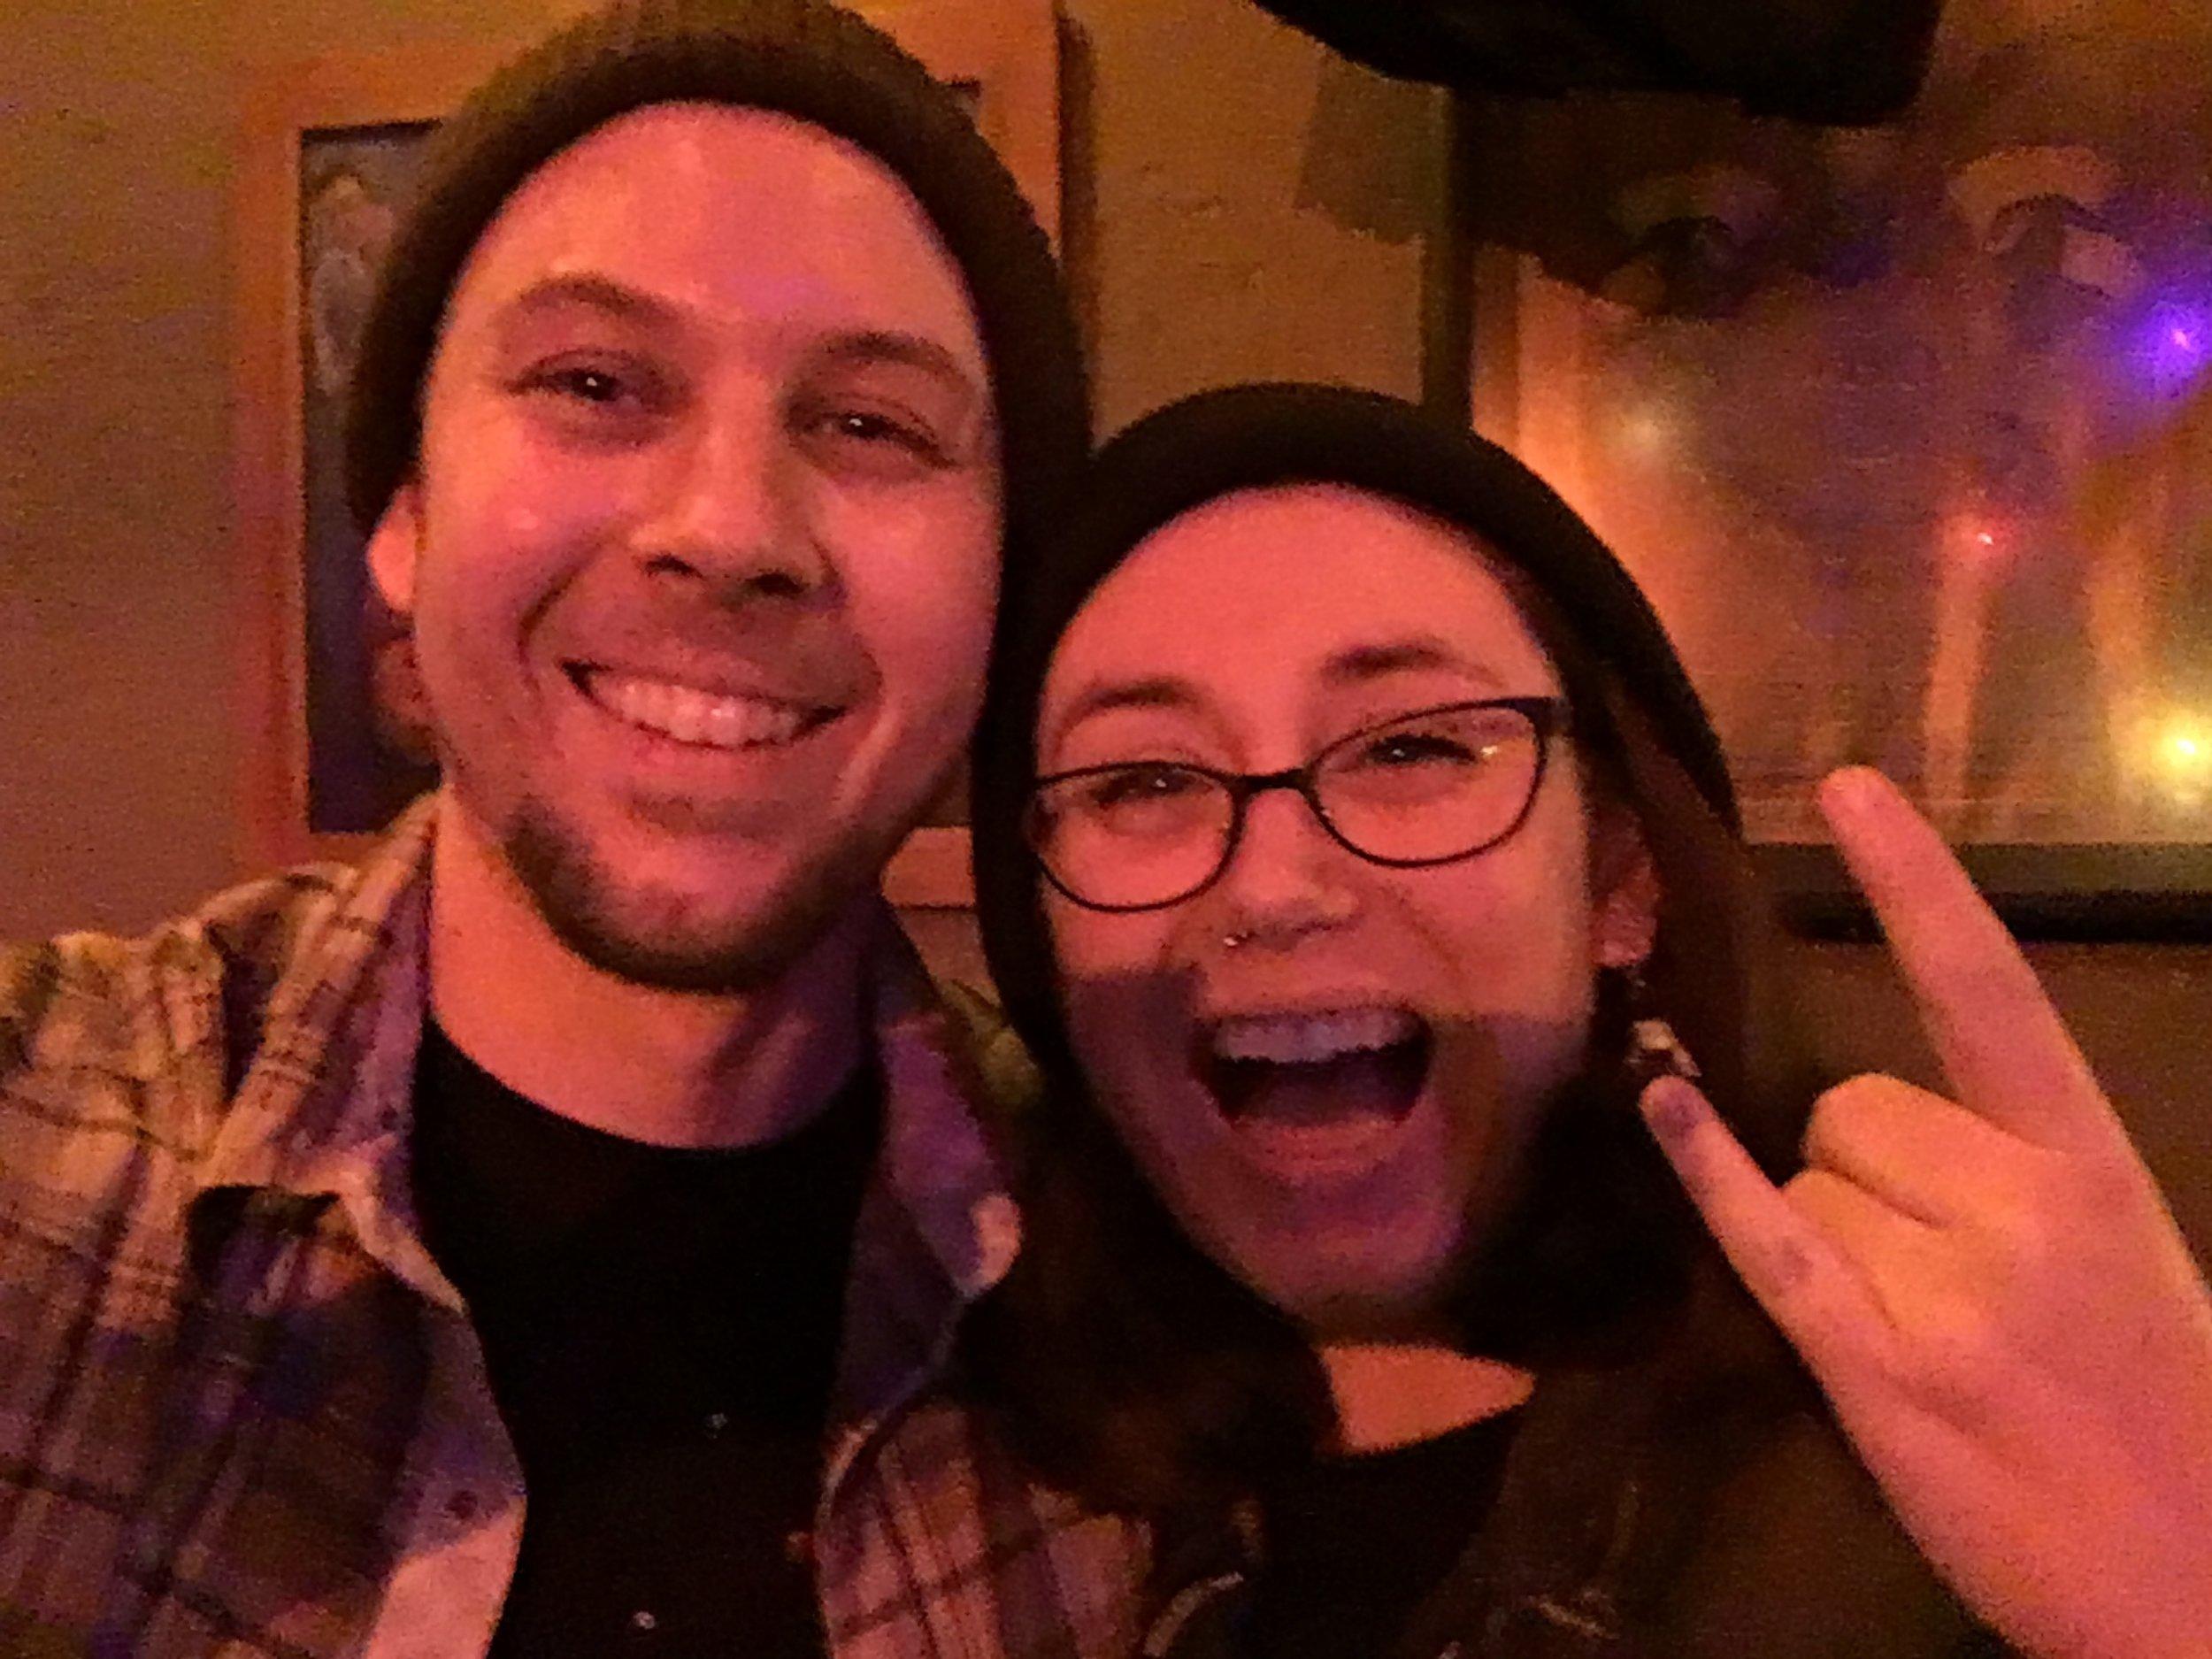 Olivia Awbrey and I, post show celebration faces...